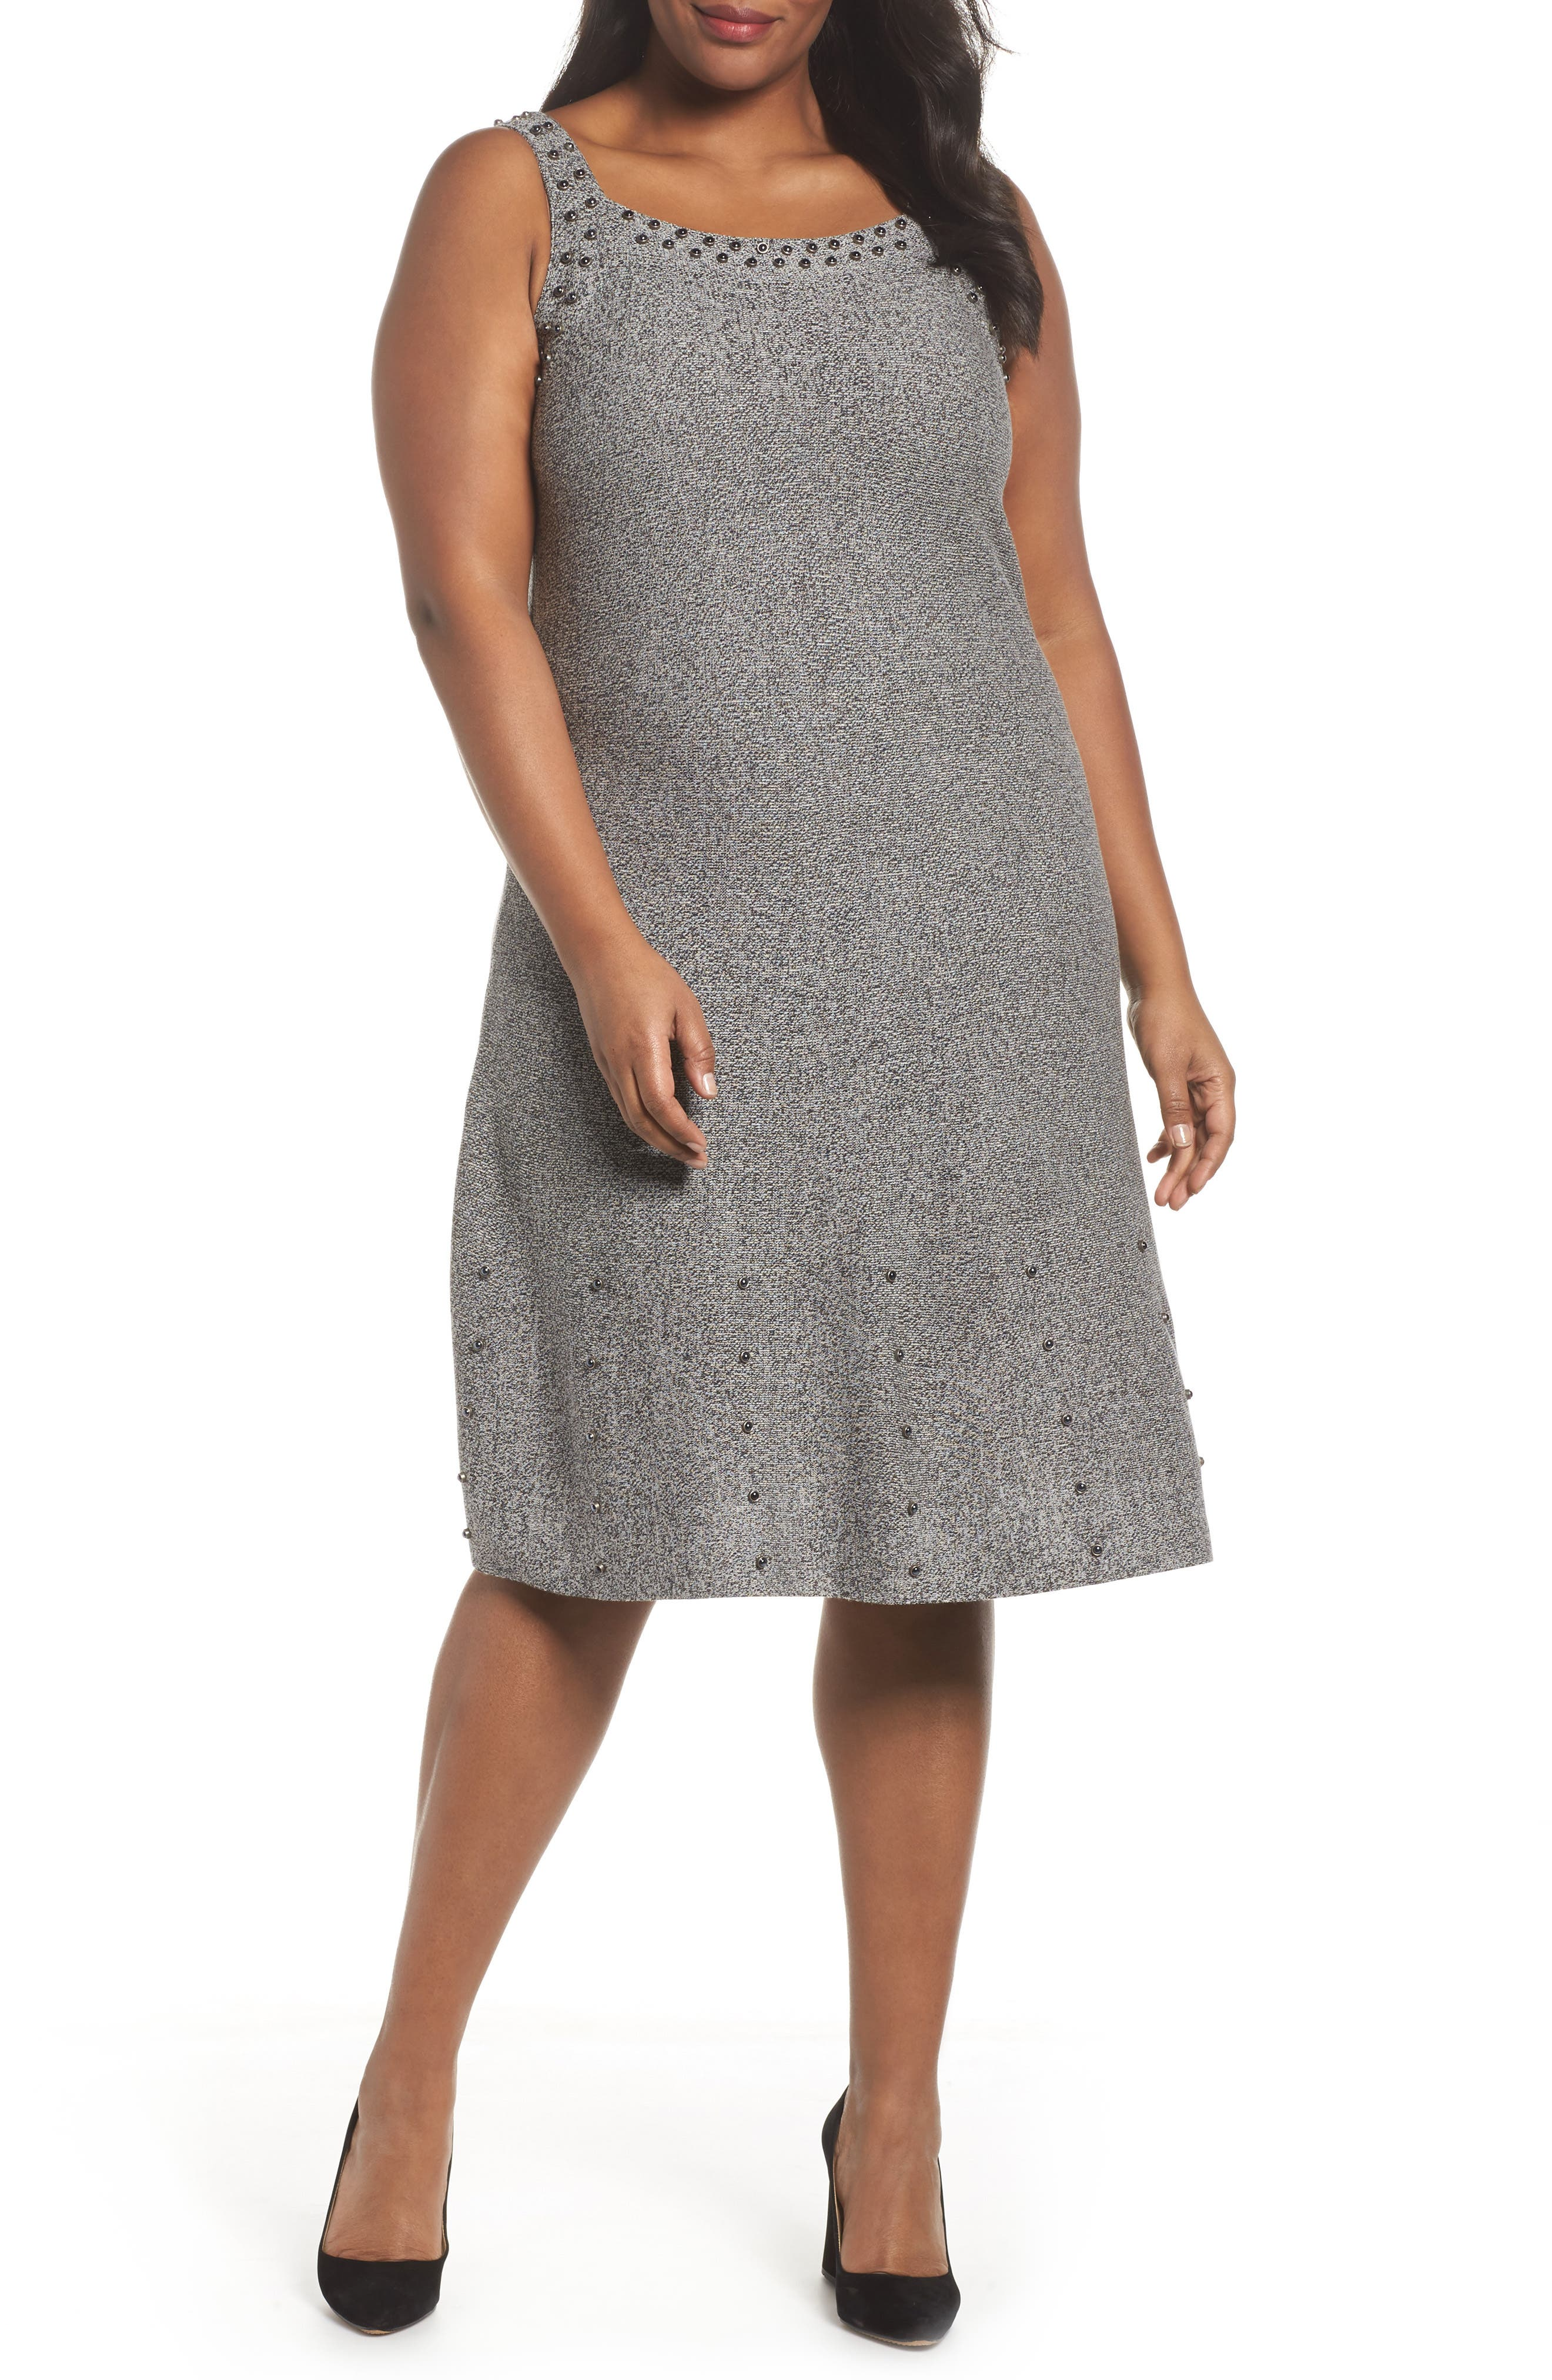 Alternate Image 1 Selected - NIC+ZOE Modern Stud A-Line Dress (Plus Size)